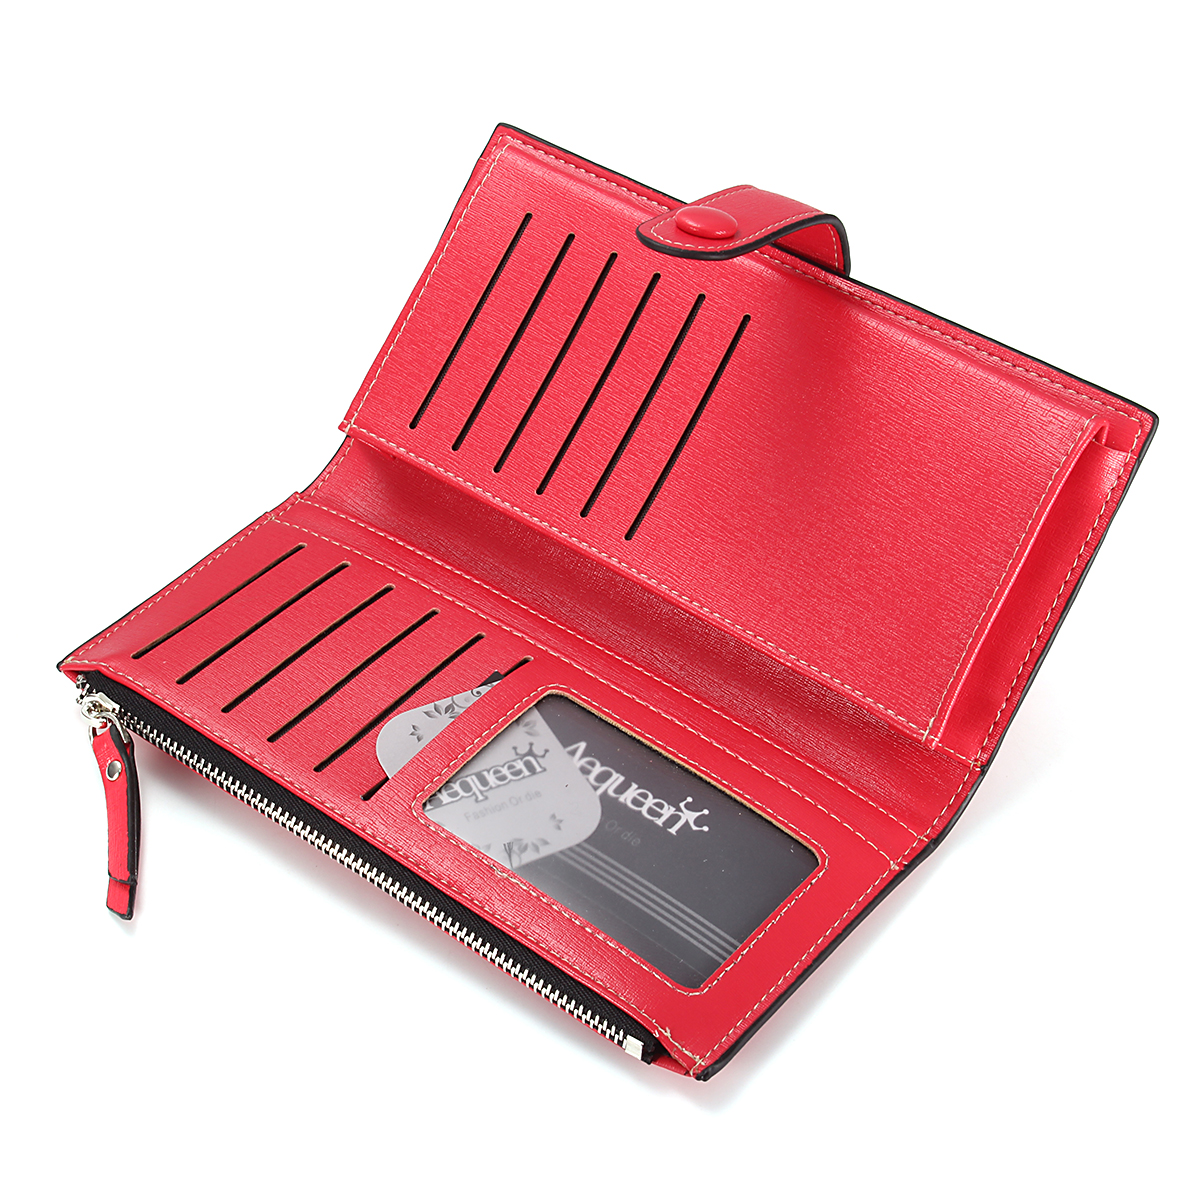 couro longo carteira feminina ferrolho Wallet Estilo : Fashion Women Wallet Zipper